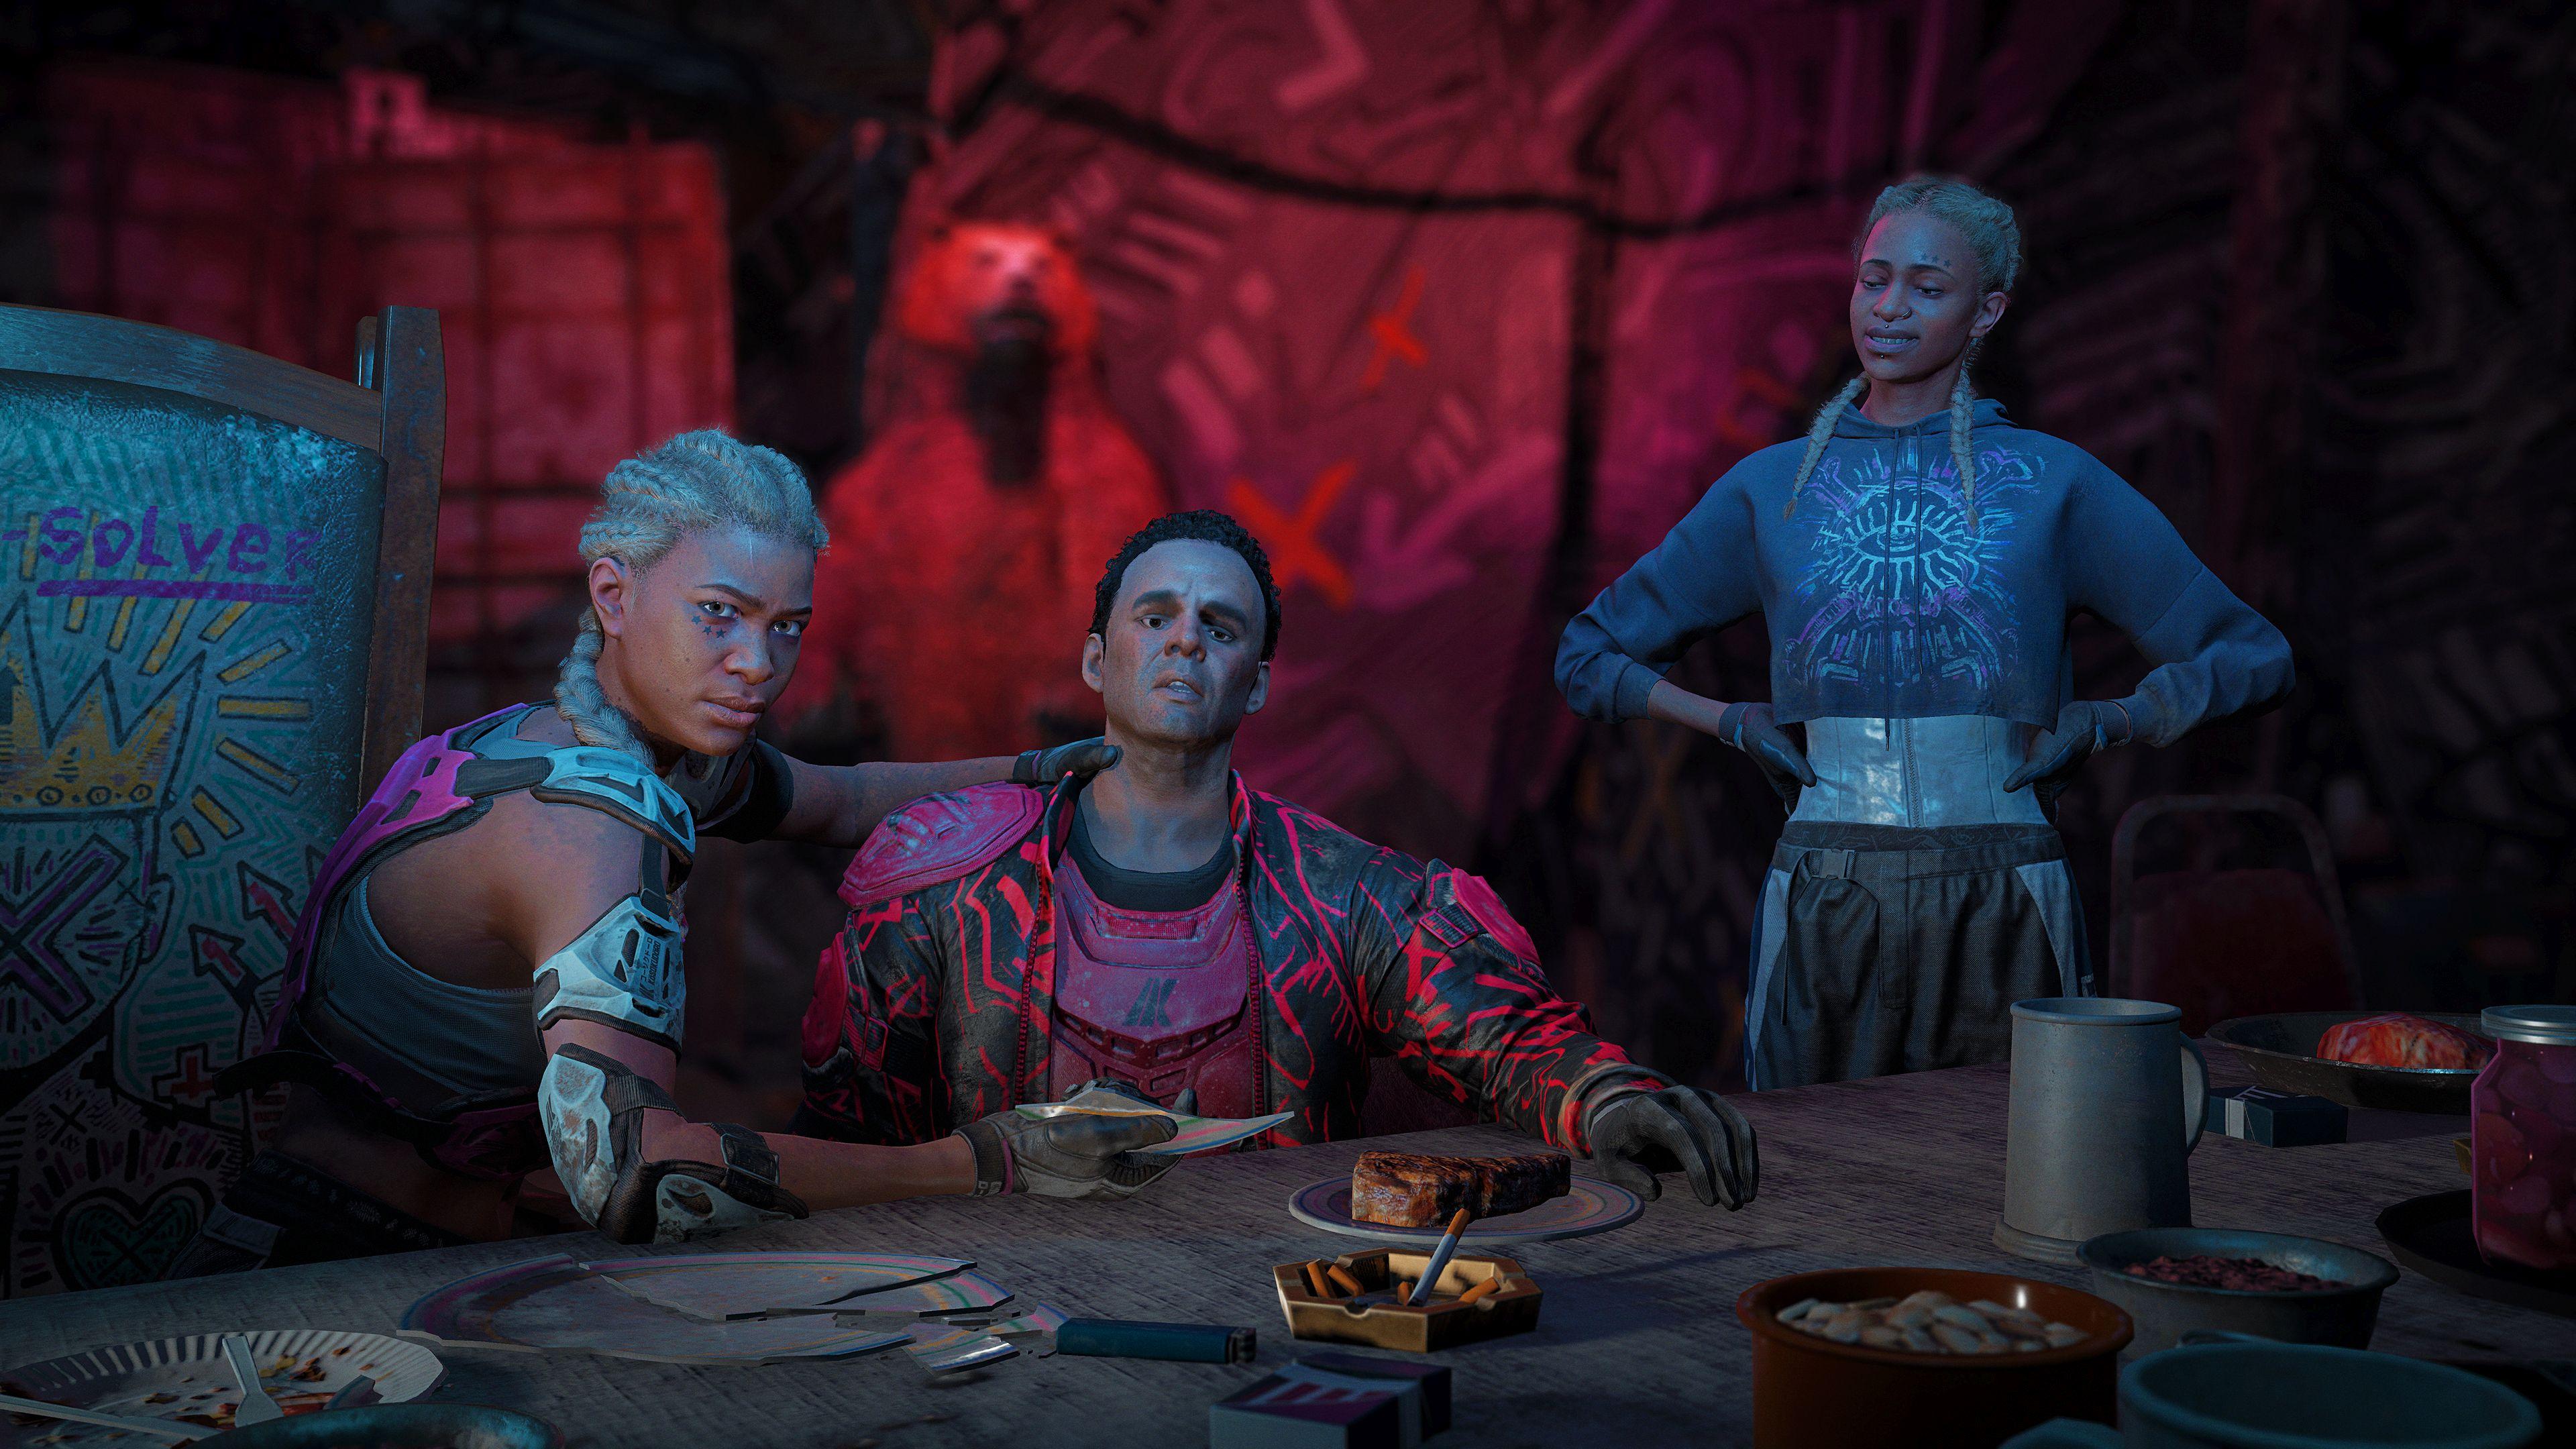 Wallpaper 4k Far Cry New Dawn 4k Game 2019 Games Wallpapers 4k